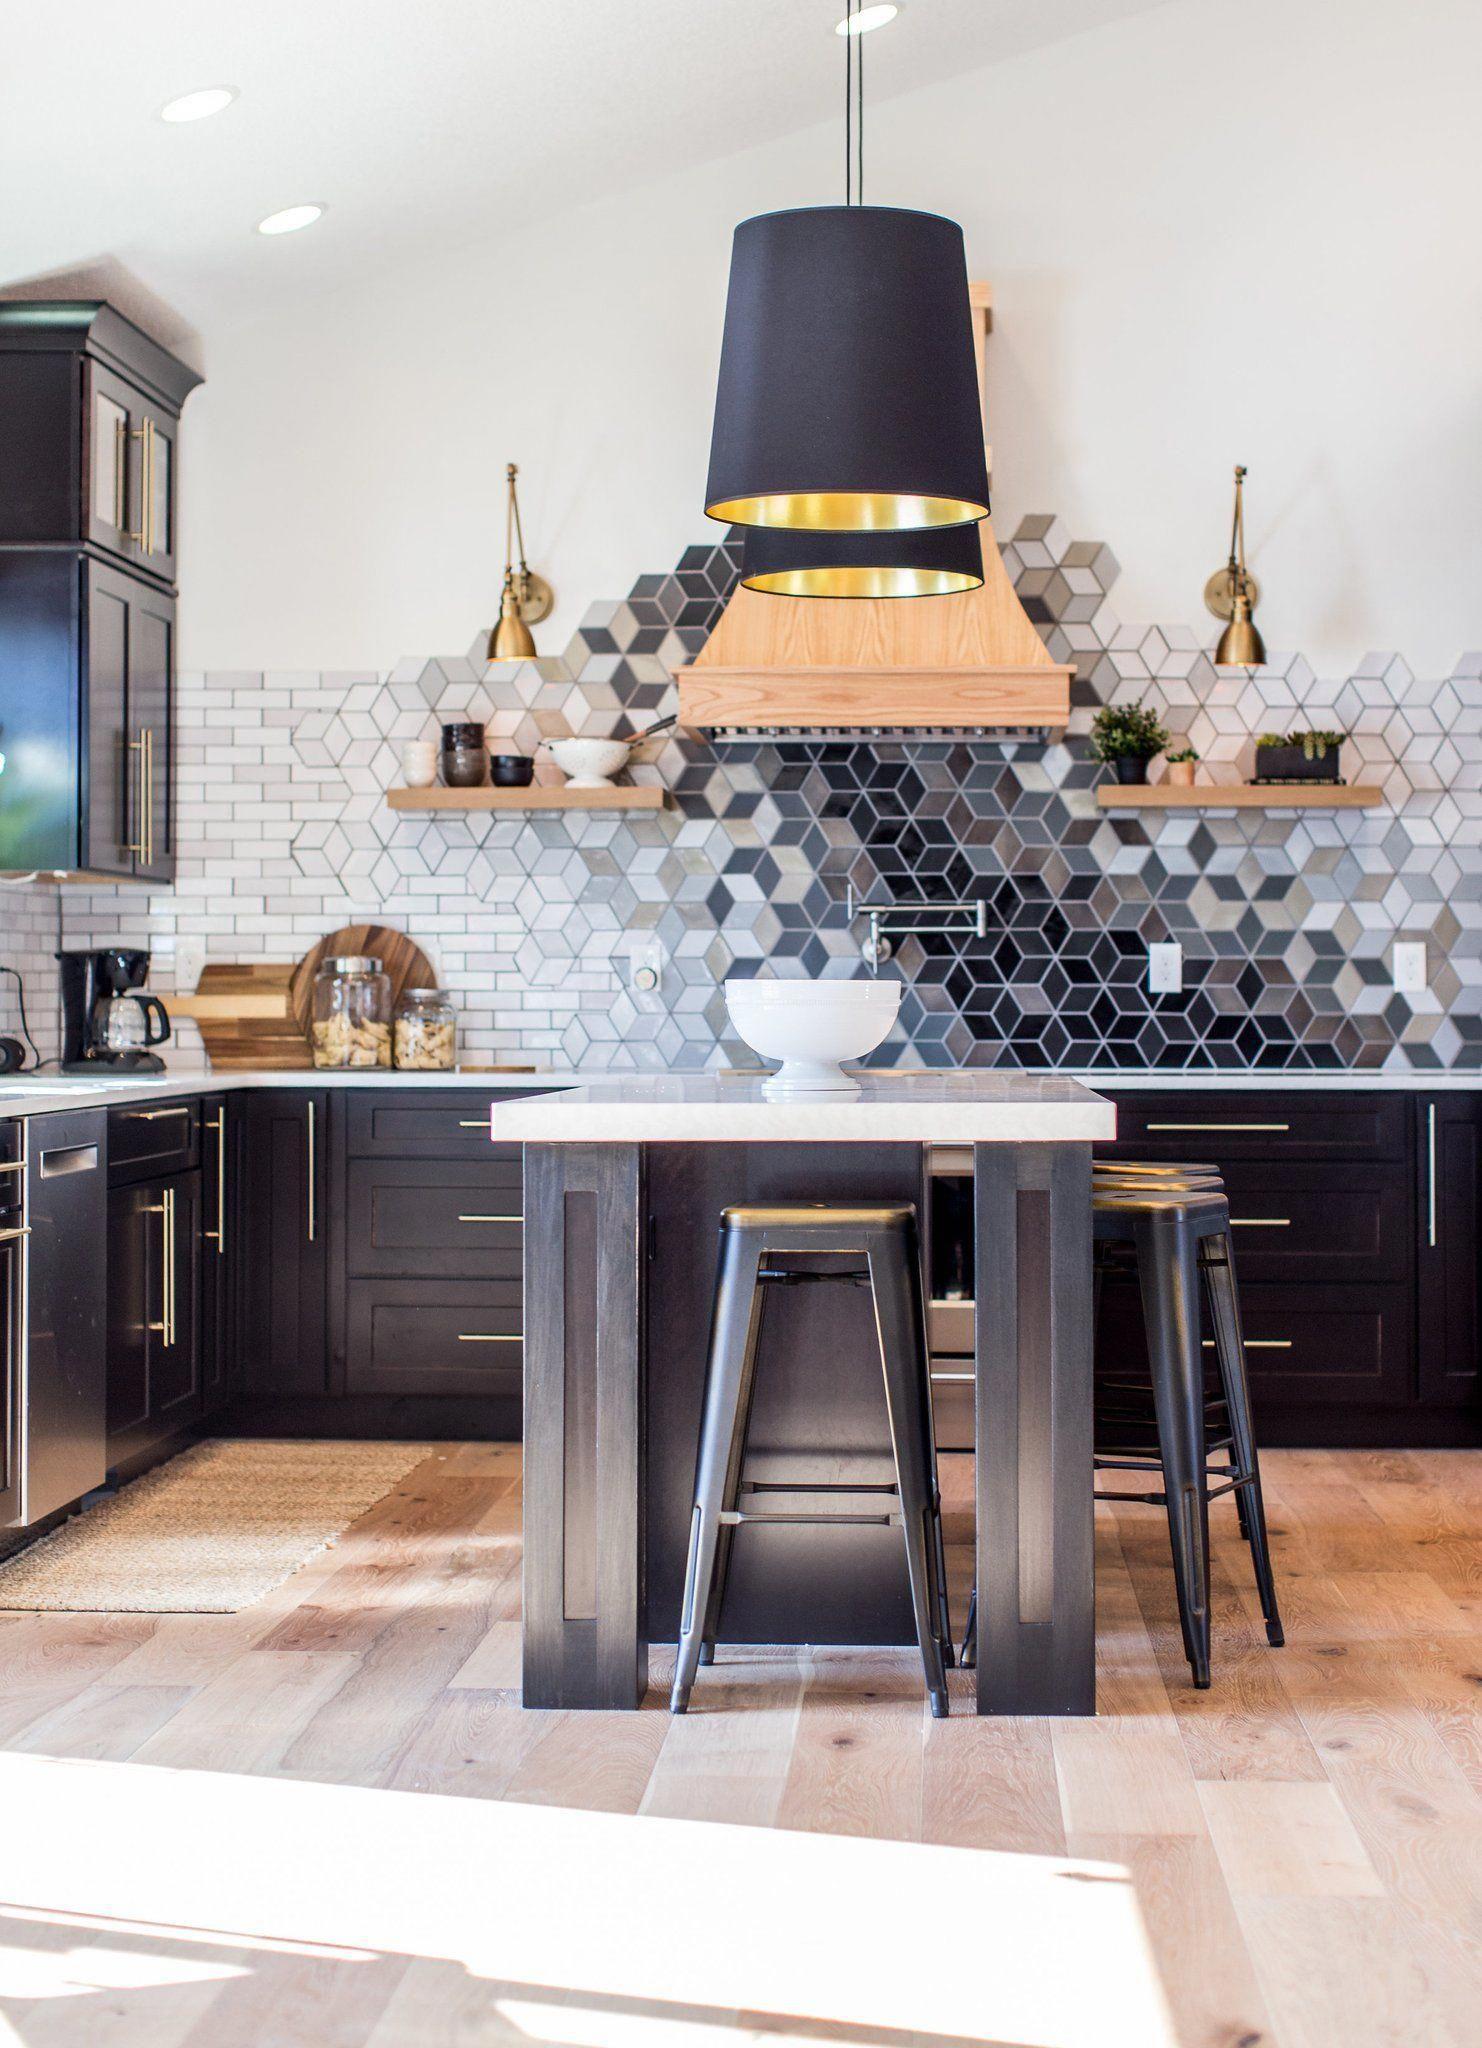 Construction2style Mercury Mosaics Tile Backsplash Modernkitchen